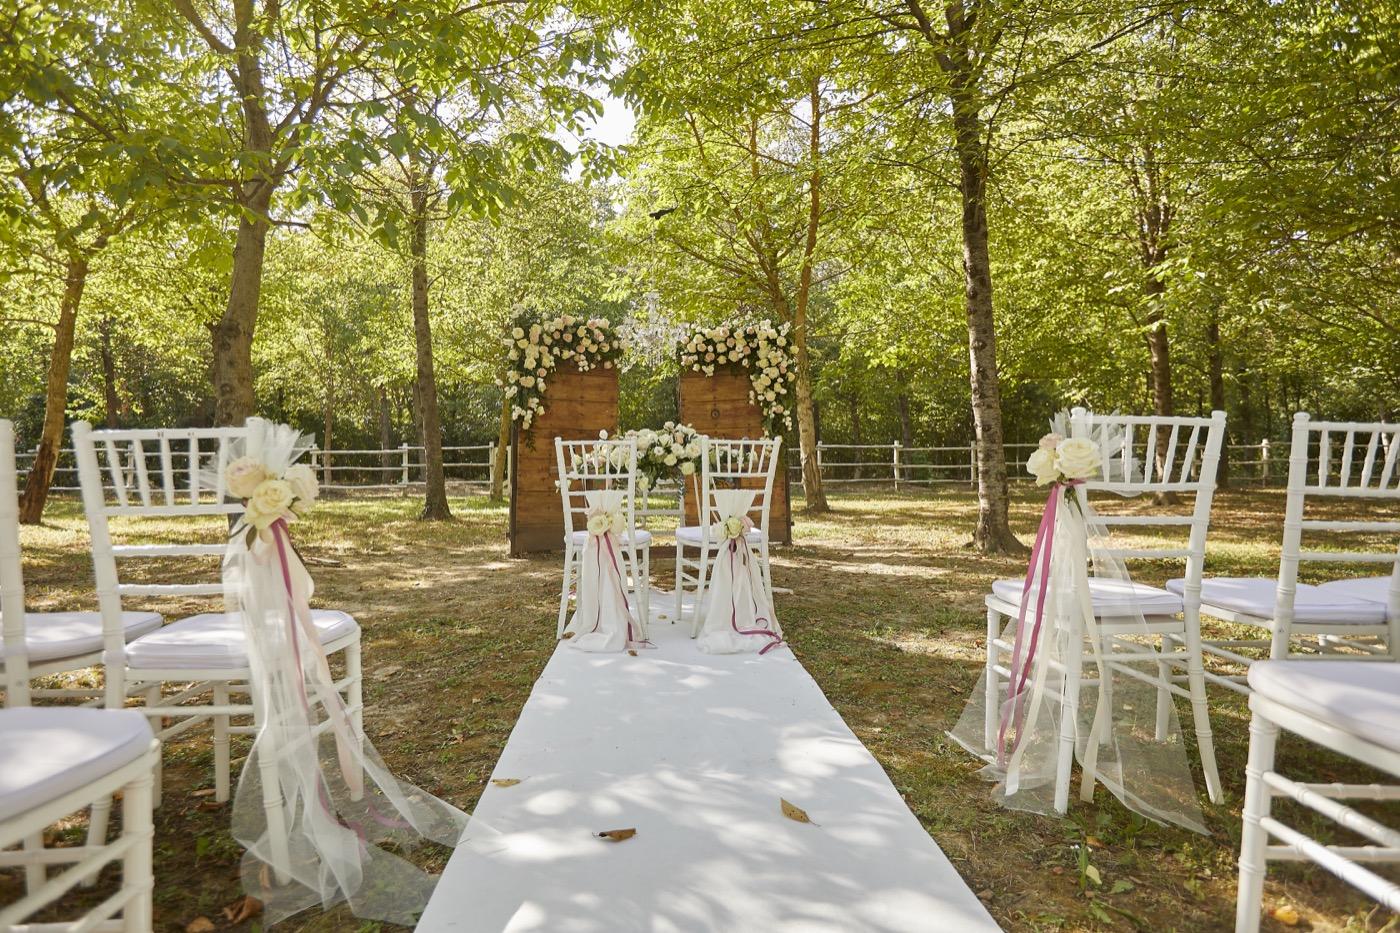 Claudio-Coppola-wedding-photographer-la-scuderia-eventi-preparativi-la-rosetta-perugia-36